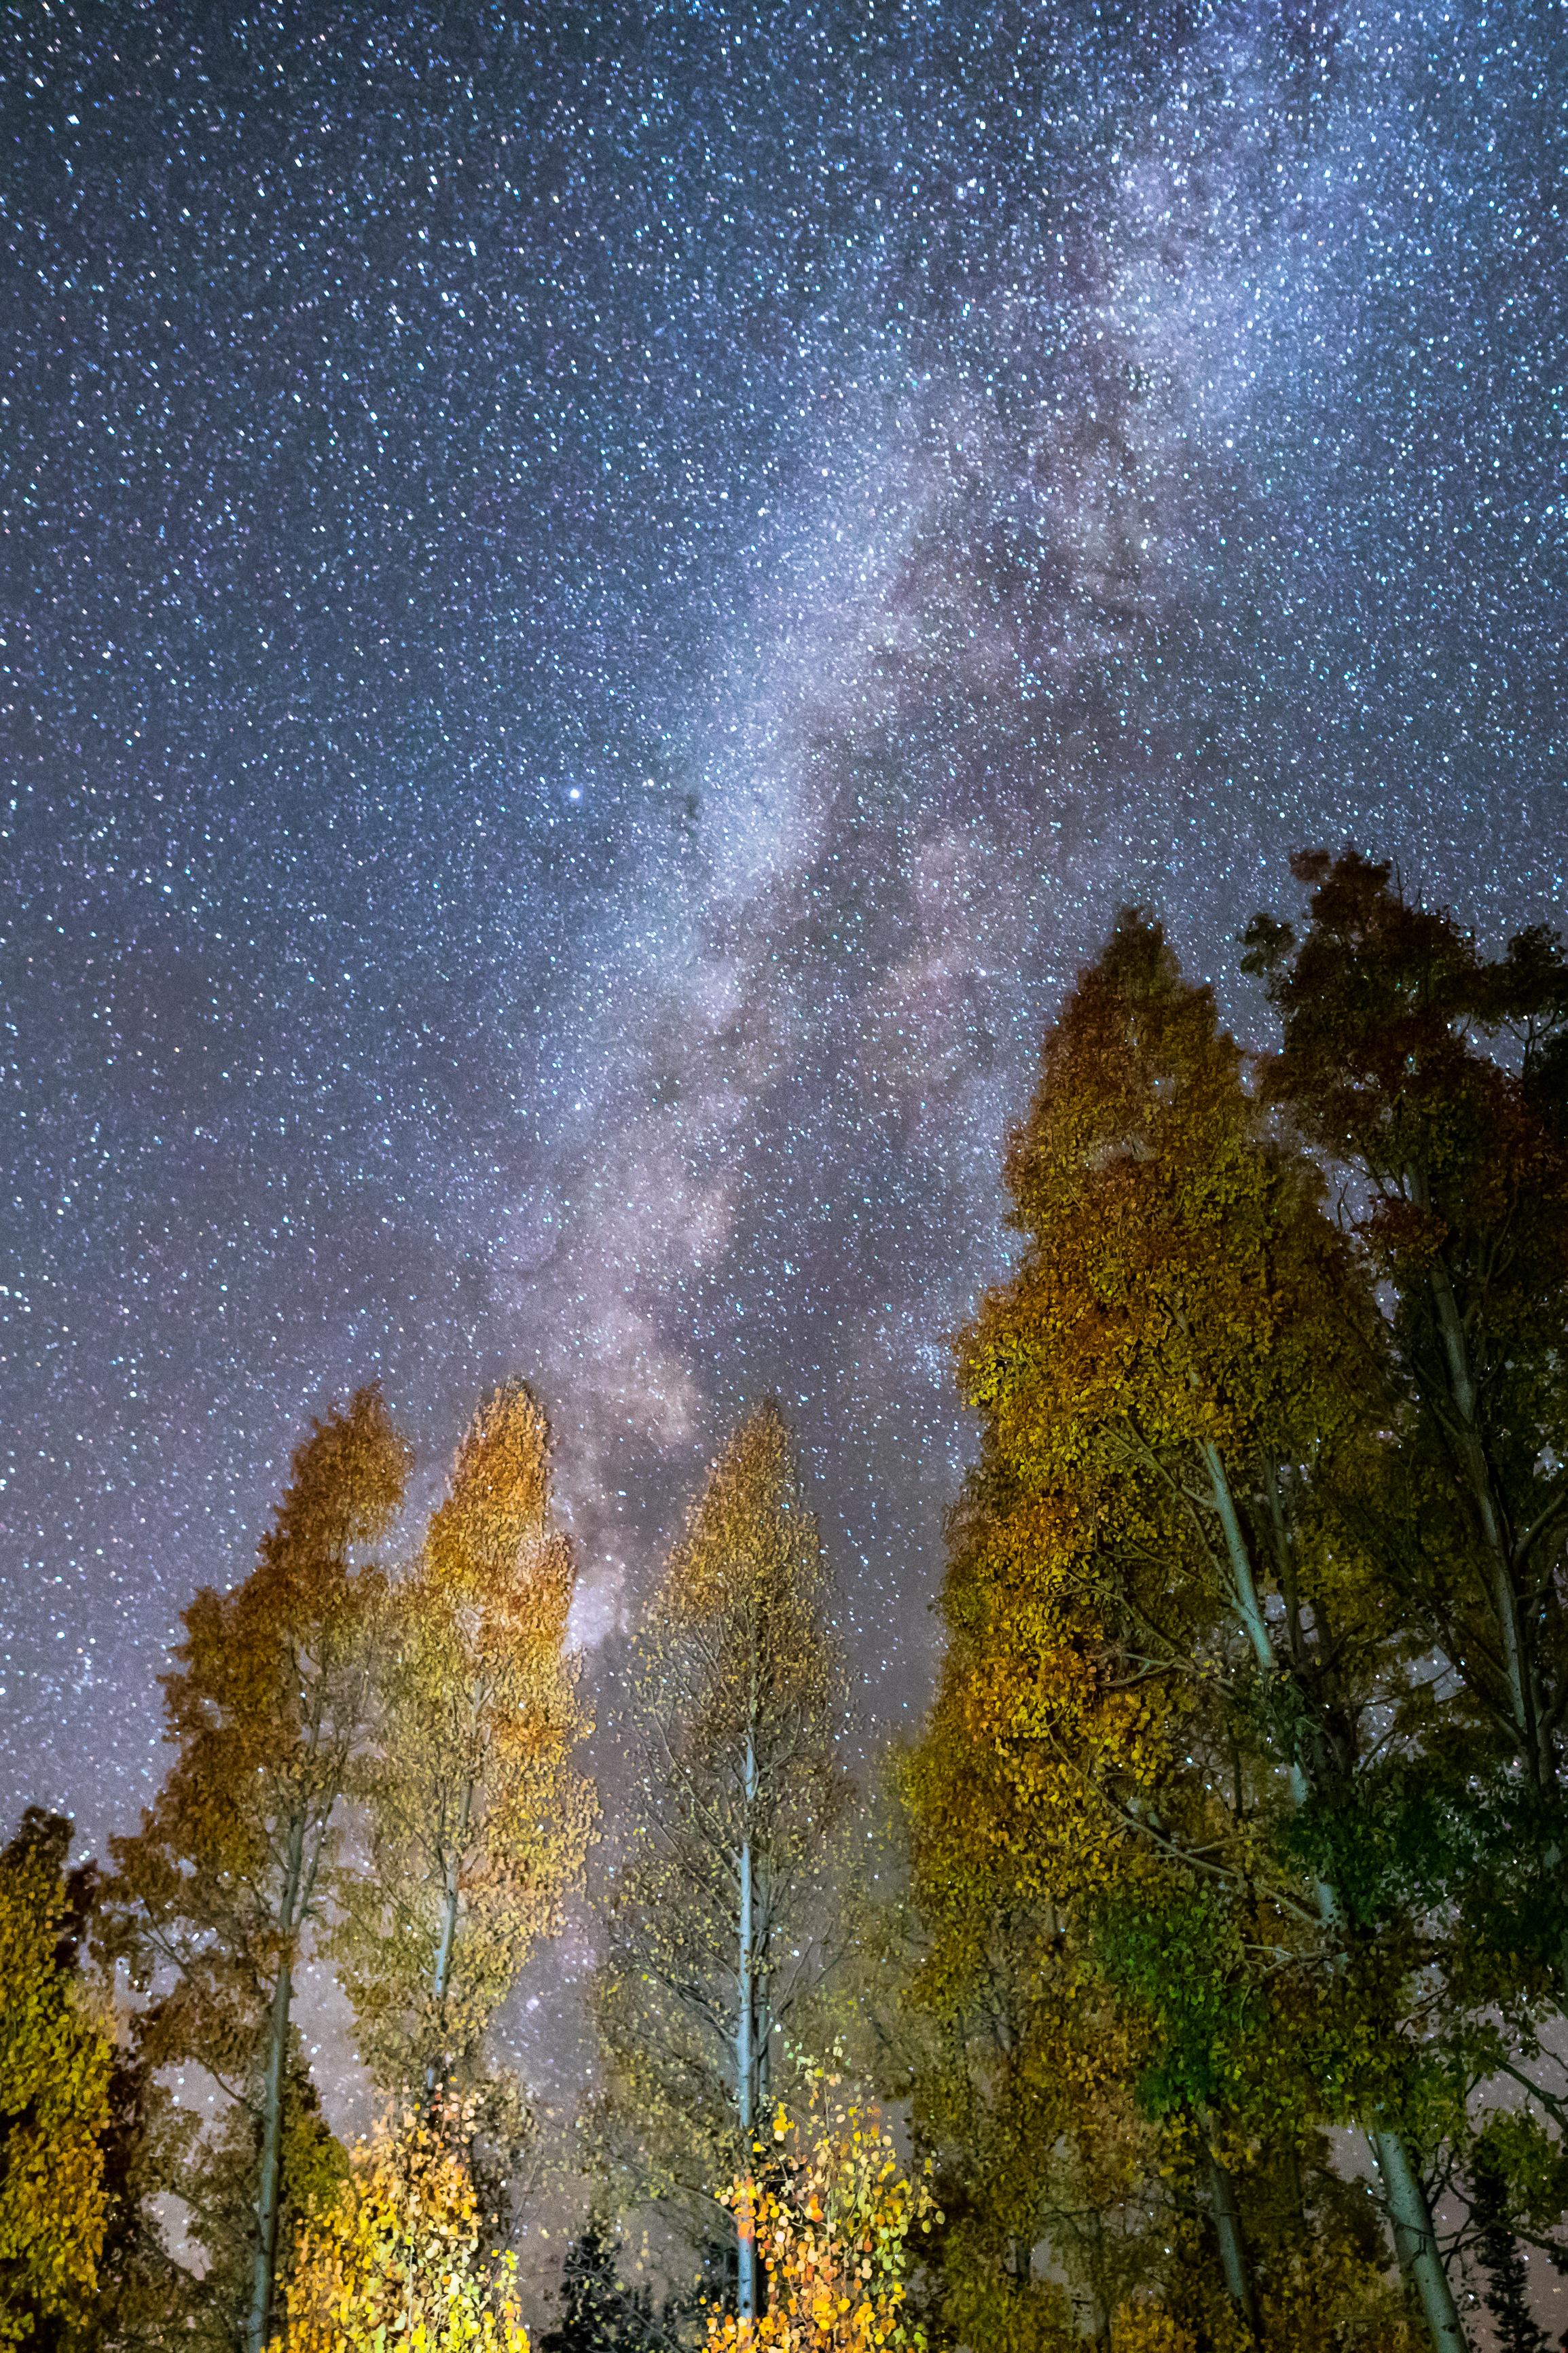 Coal Bank Pass Fall Colors and Milky Way, Image #1809